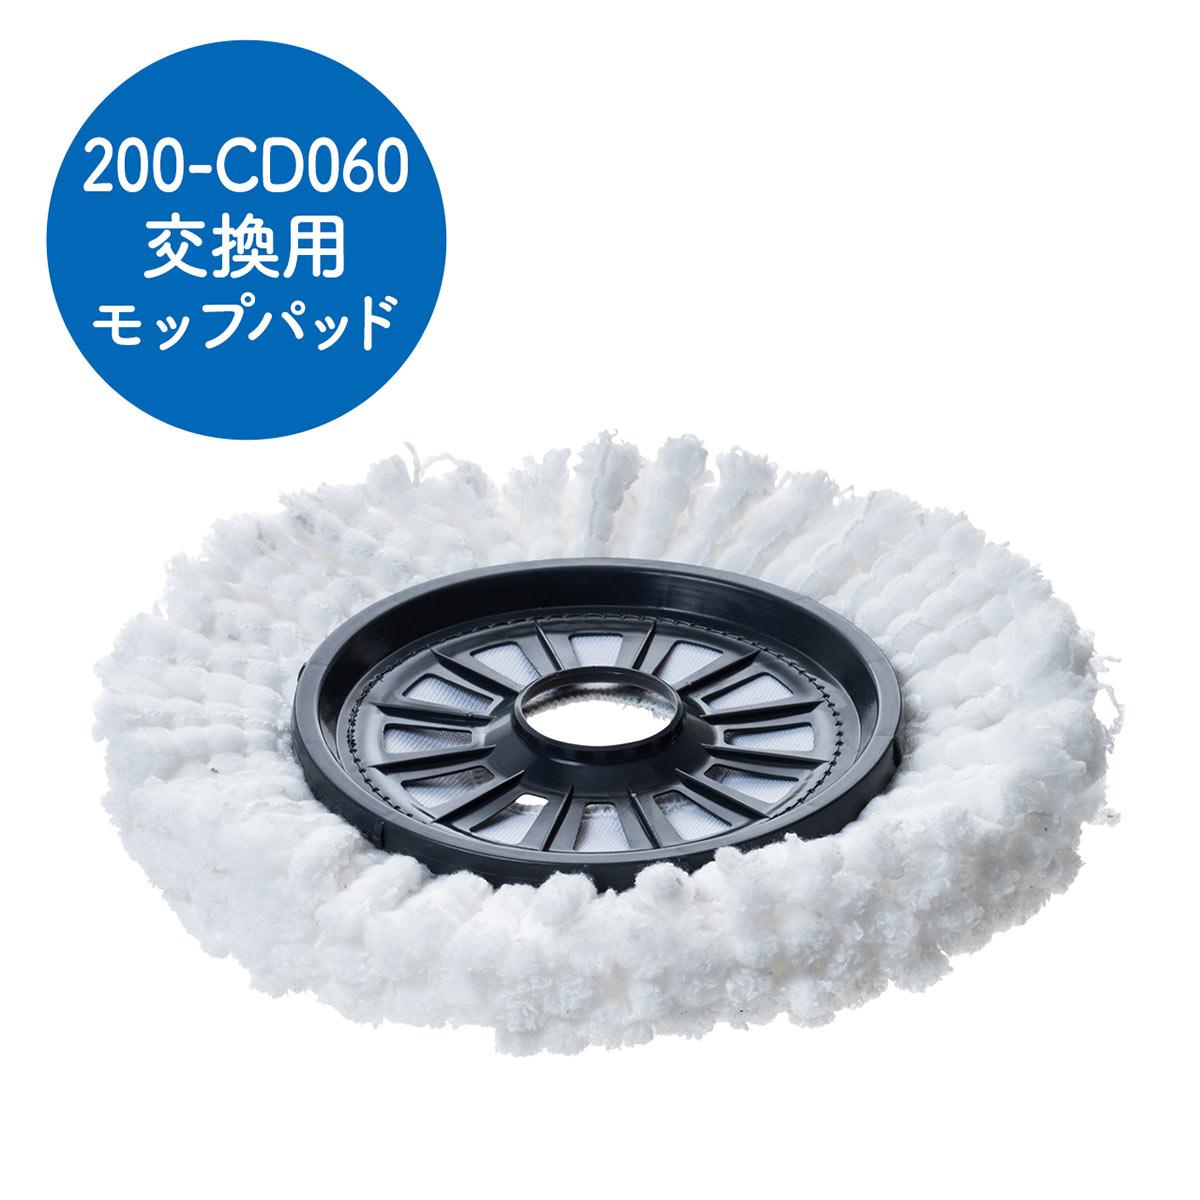 200-CD060P サンワダイレクト限定品 交換用モップ 卓抜 大掃除 卸売り 200-CD060専用 2個入り